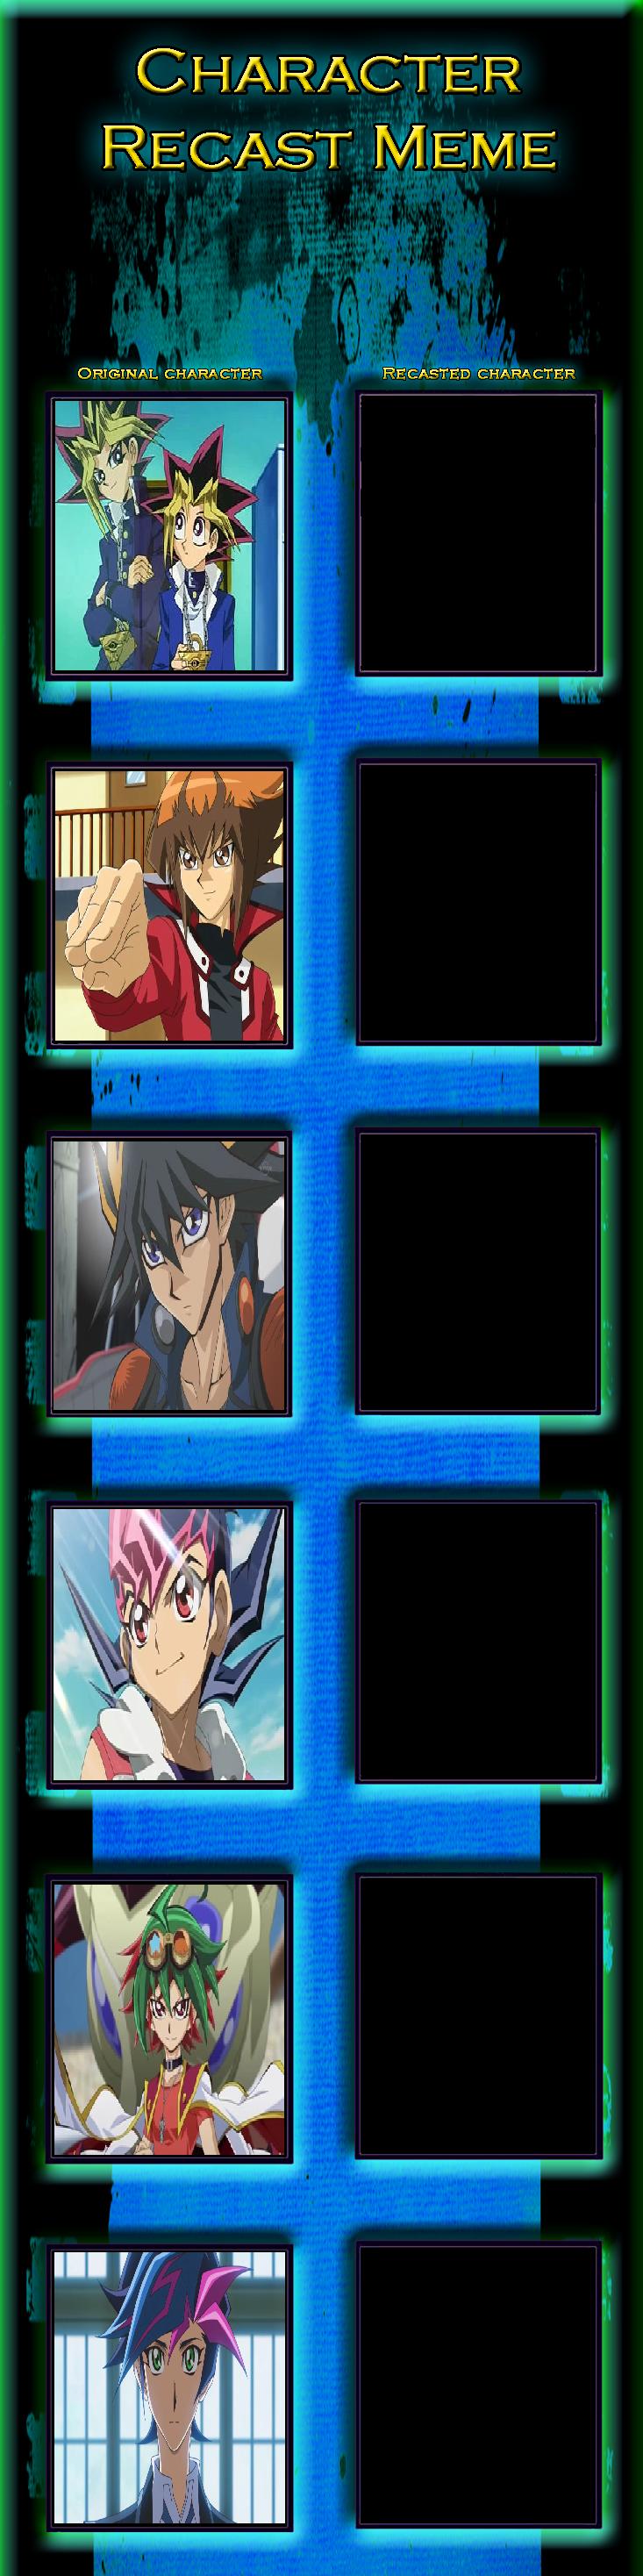 Yu-Gi-Oh! Protagonist Recast Meme by MarioFanProductions